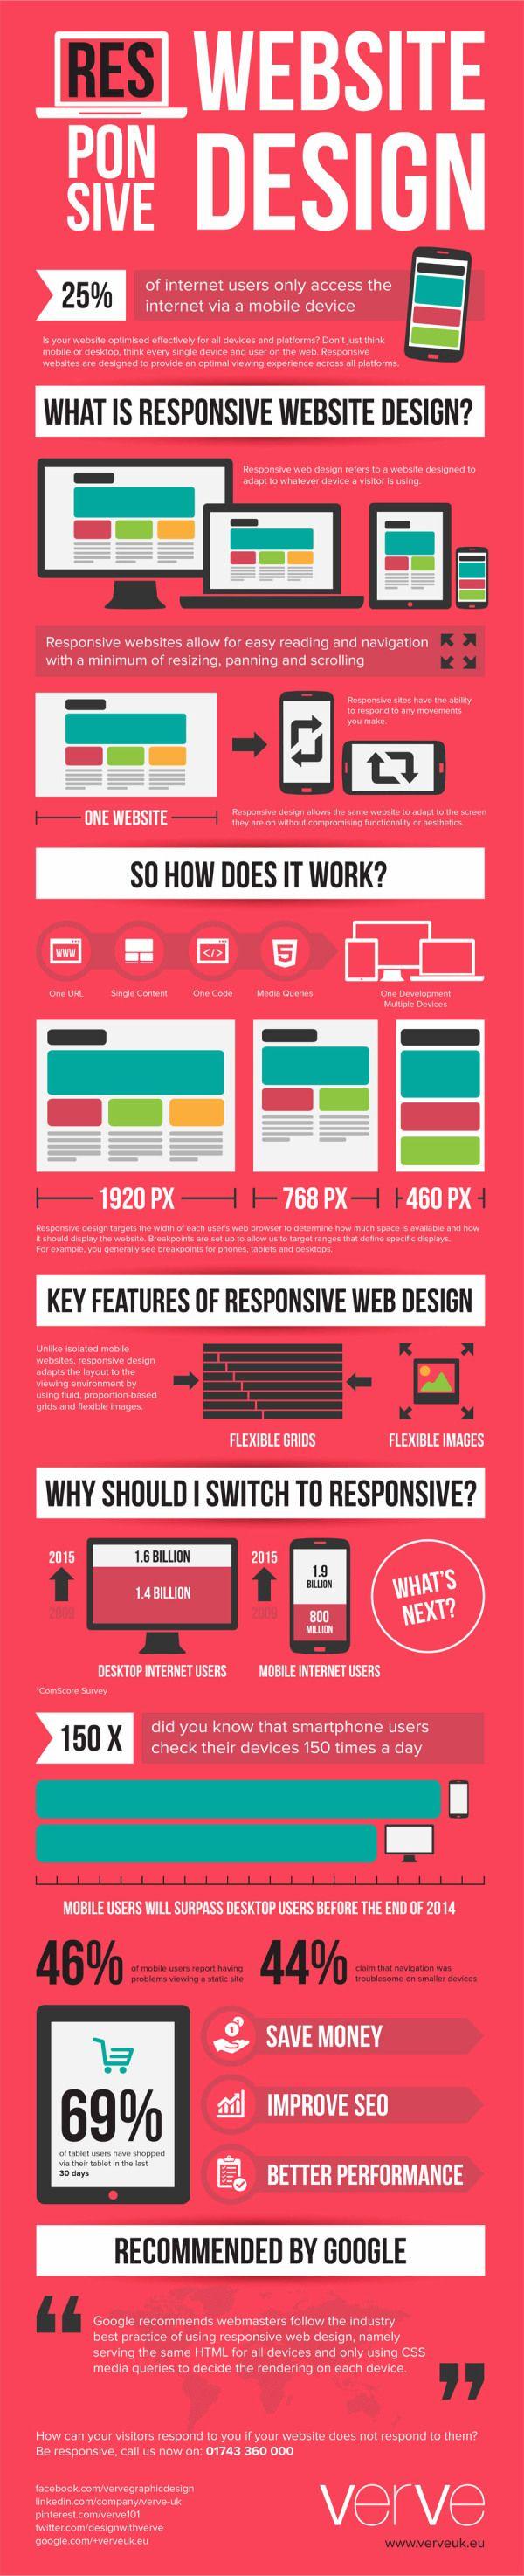 How Responsive WebSite Design Works [Infographic]